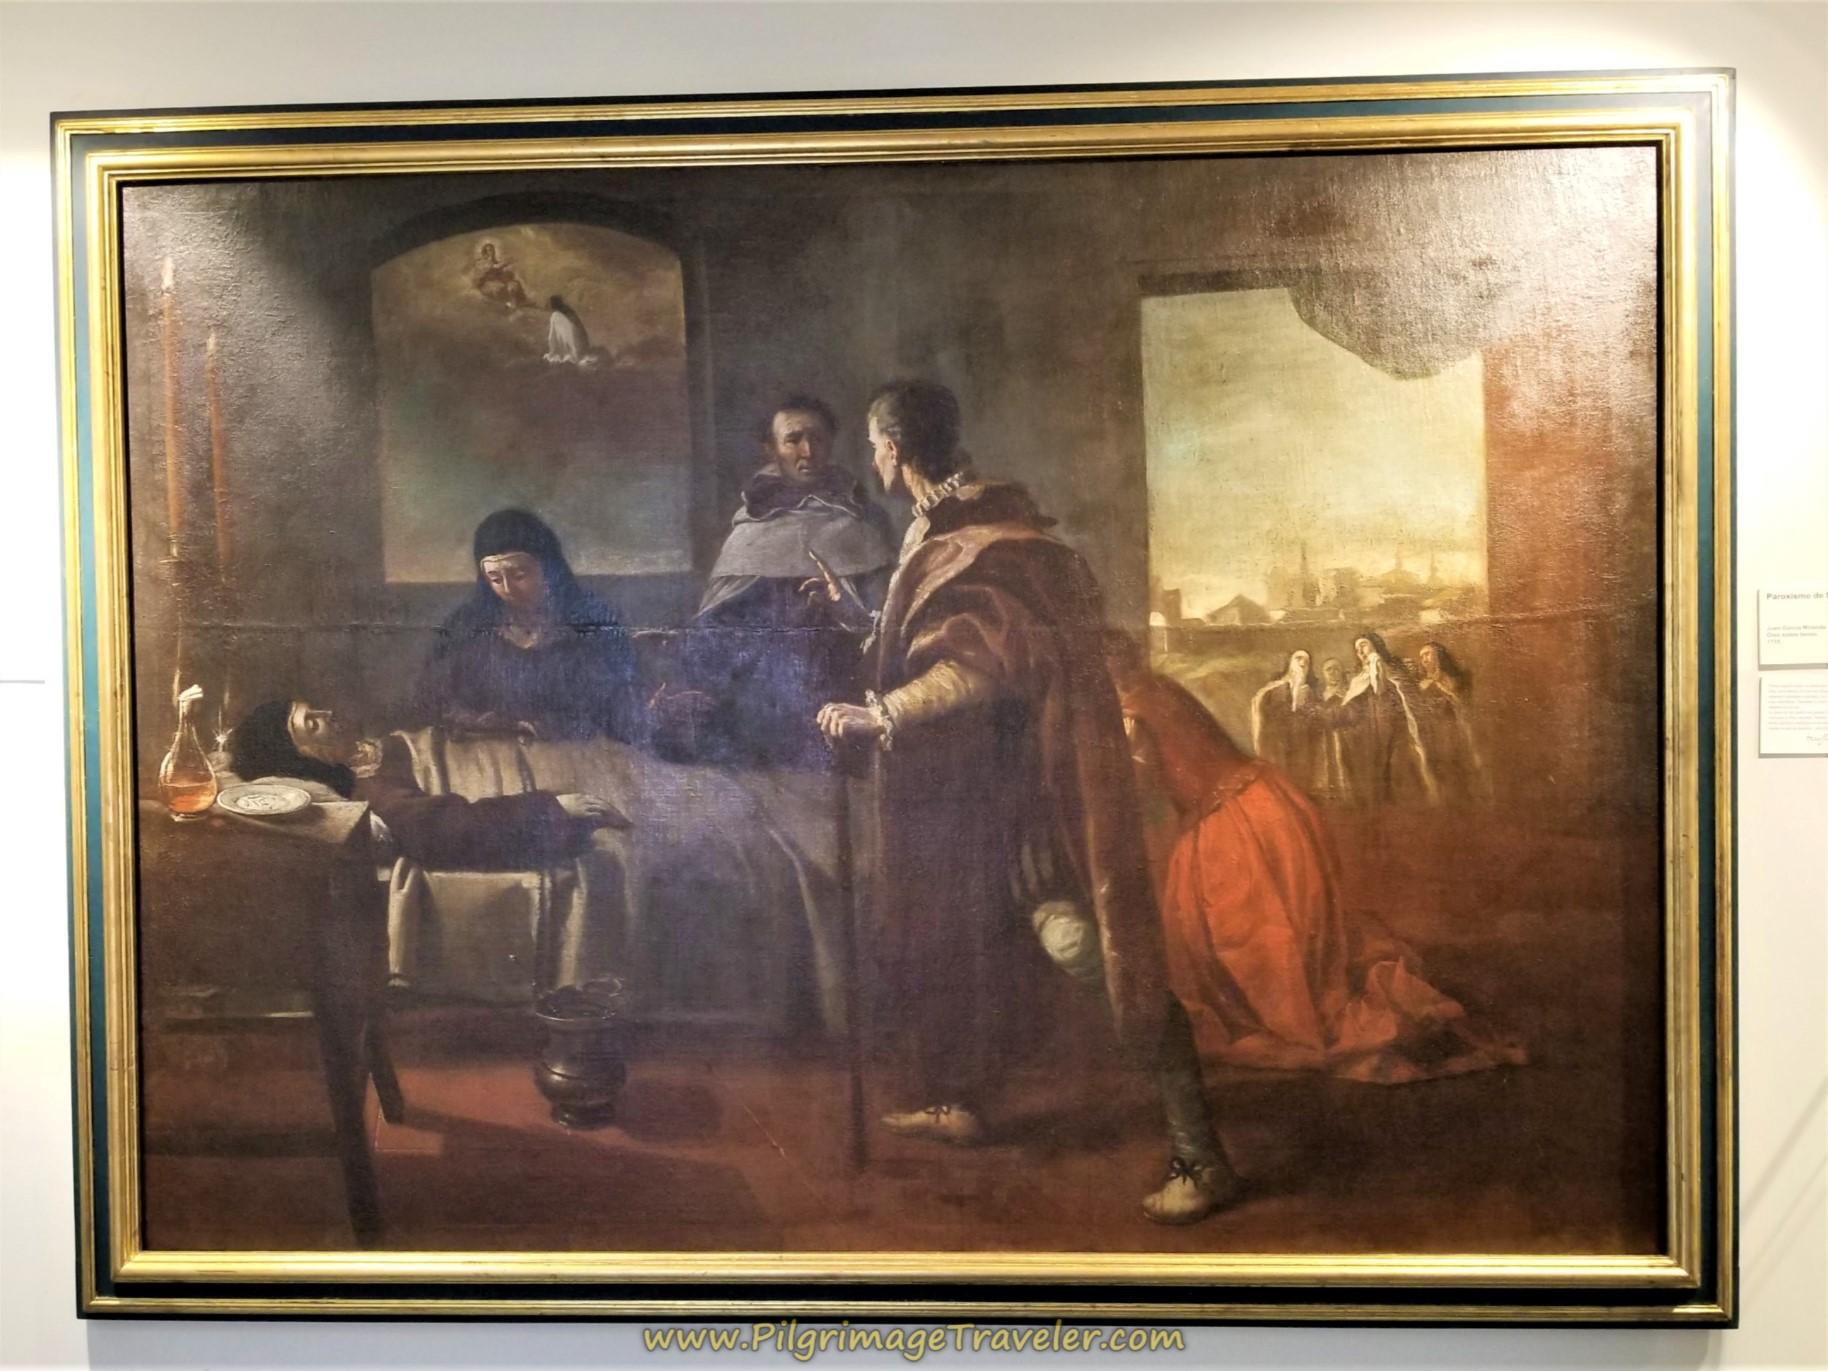 Painting of Funerary Scene of St. Teresa, Museo Carmelitano